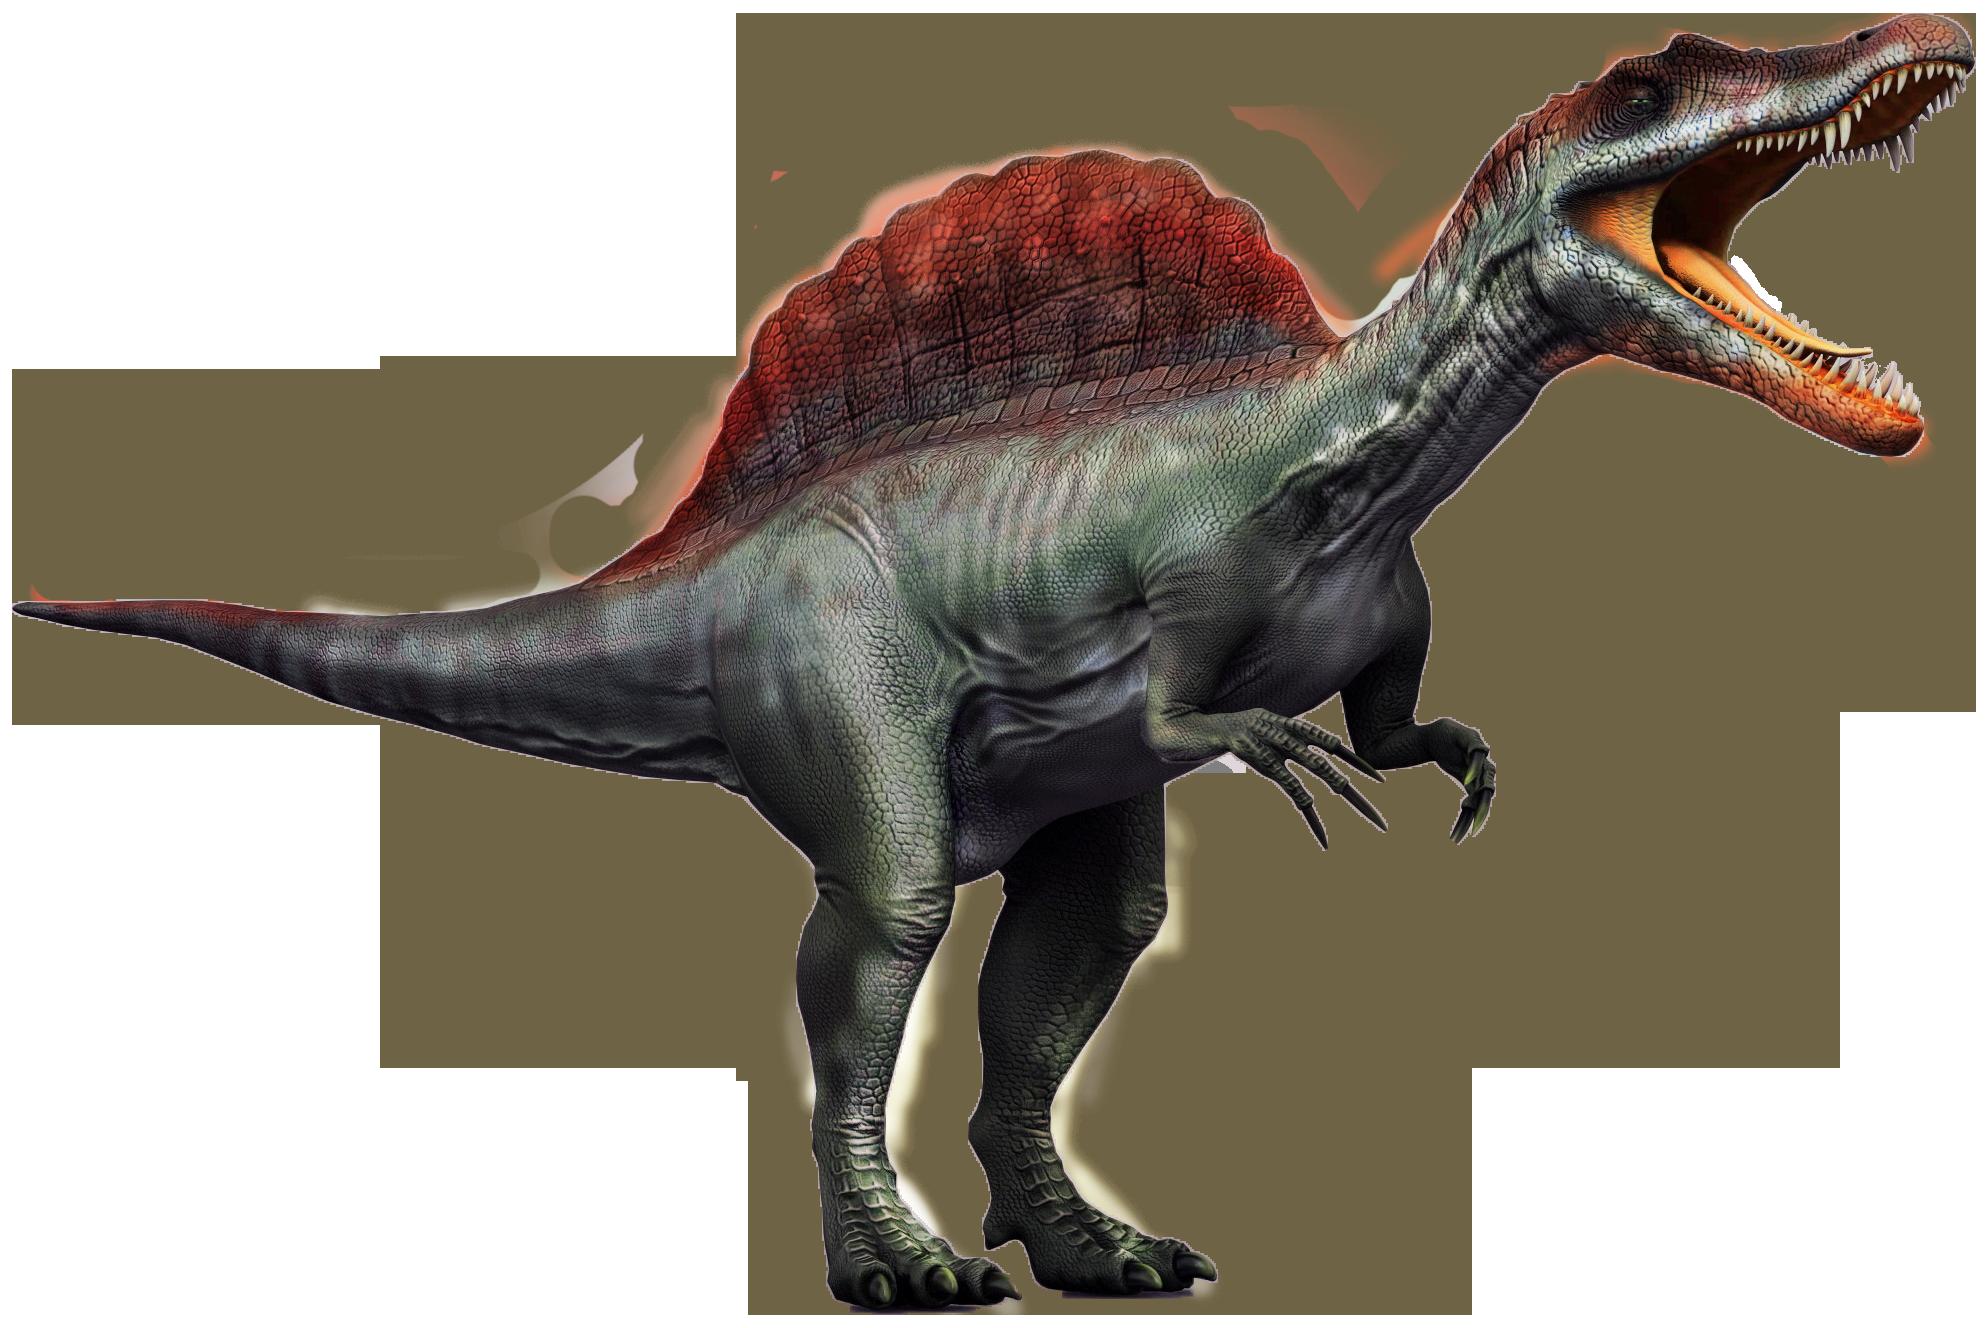 spinosaurus aegypticus by darbarrrr on deviantart